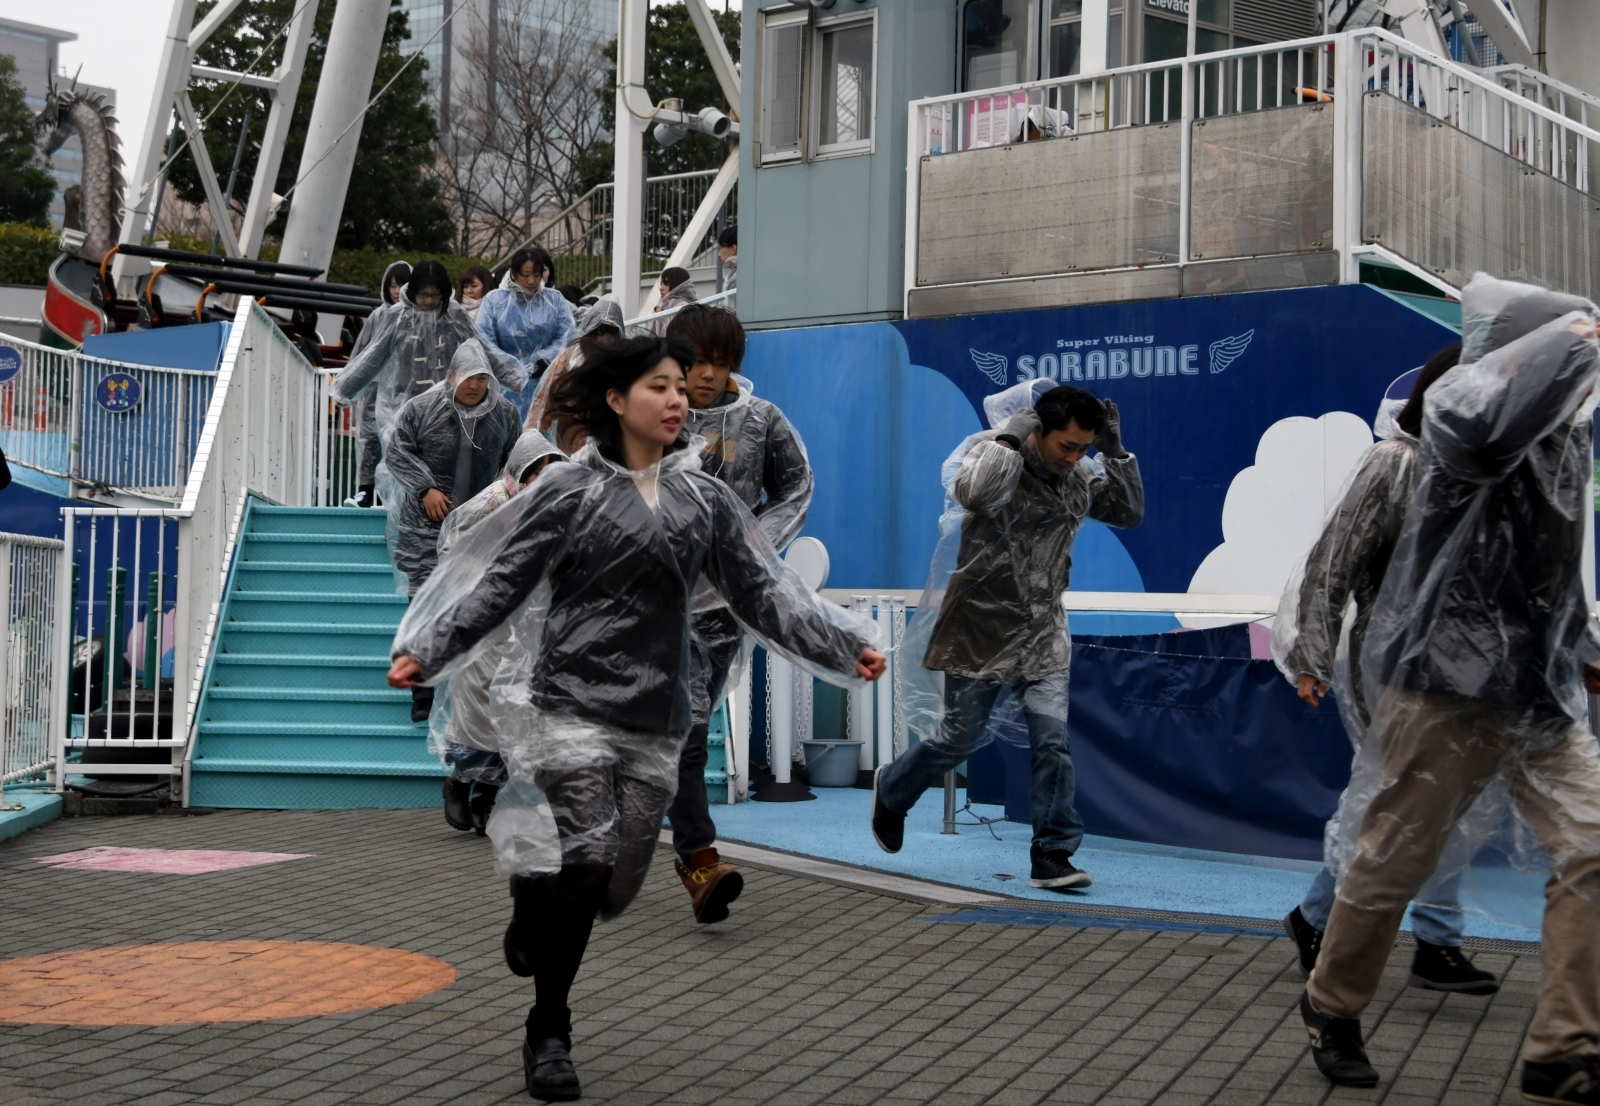 Tokyo evacuation drills